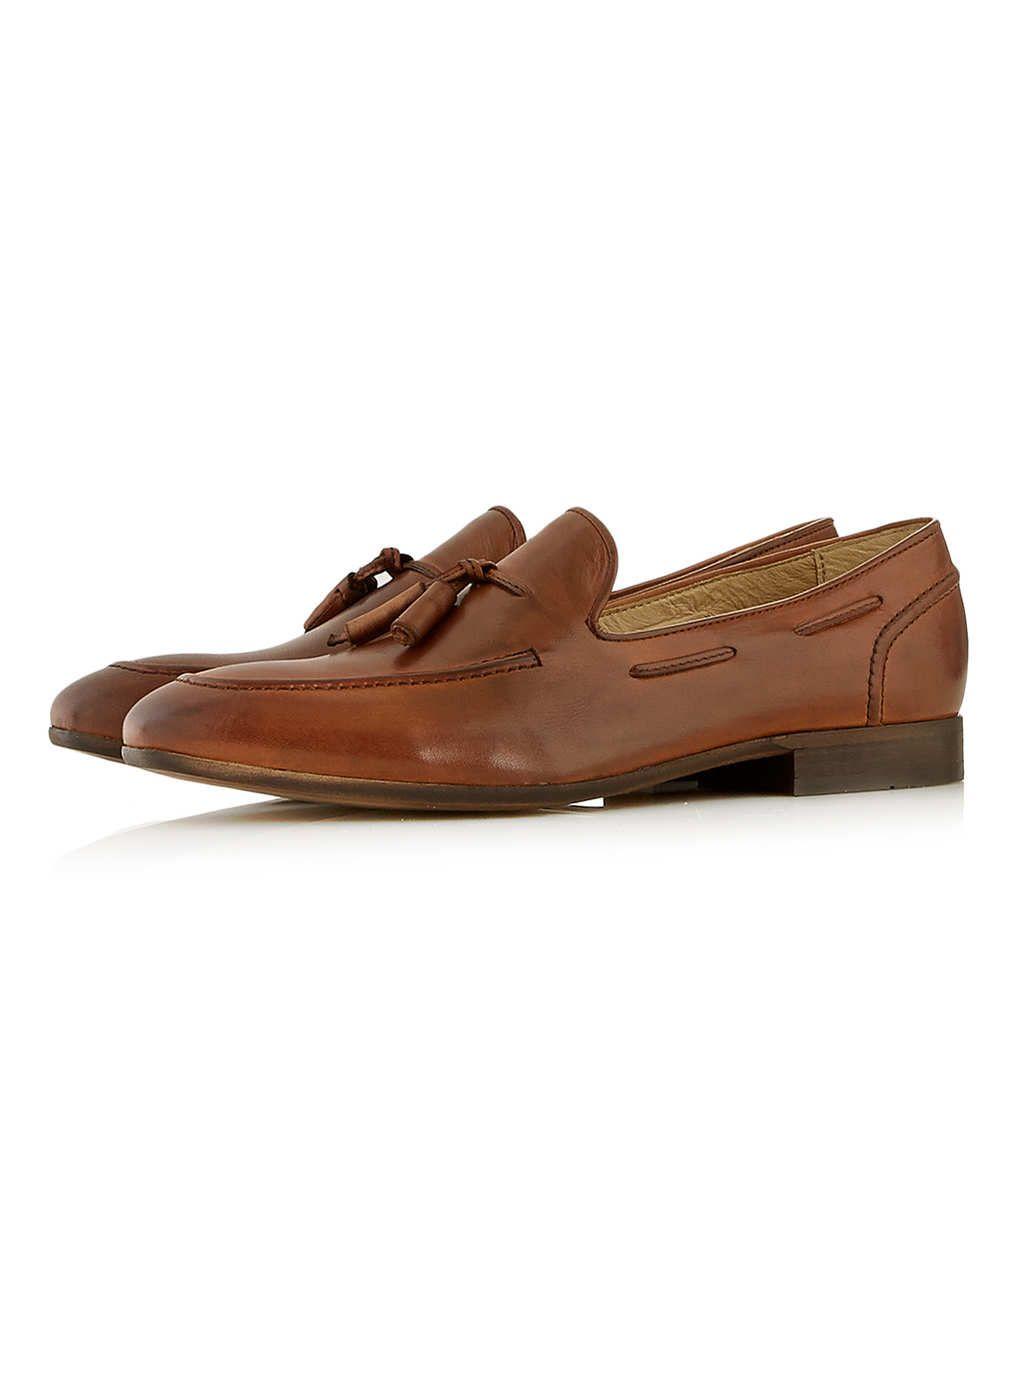 2016 Hot Sale Dune Rink Plain Almond Toe Derby Shoes Men Black FMMAA69